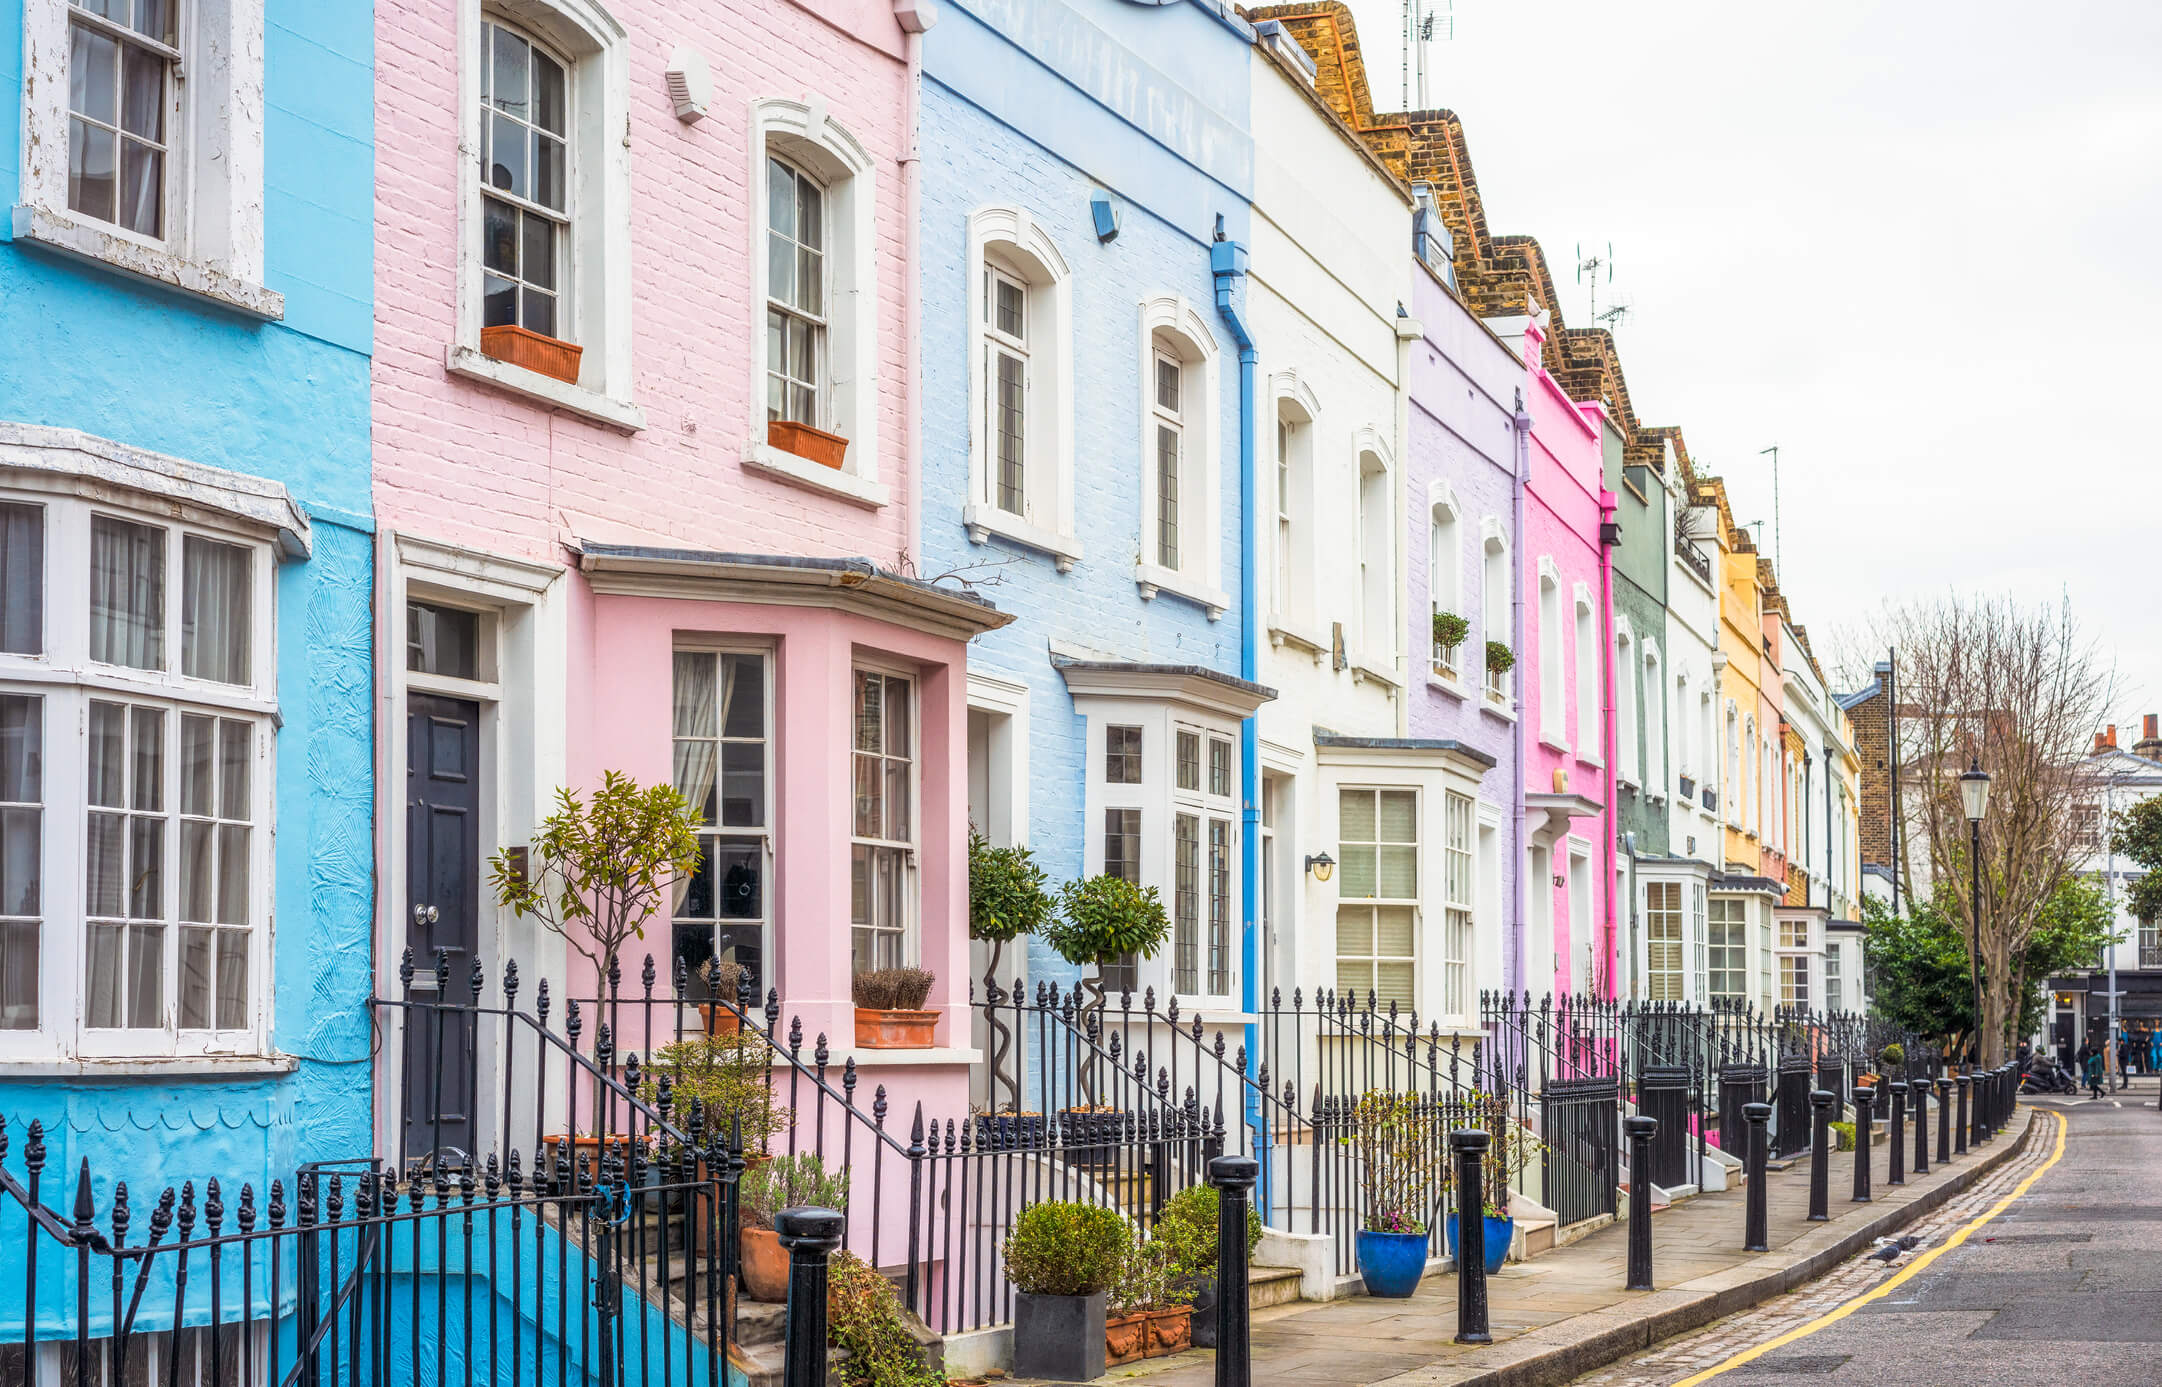 Multi-coloured street of houses in Chelsea,London